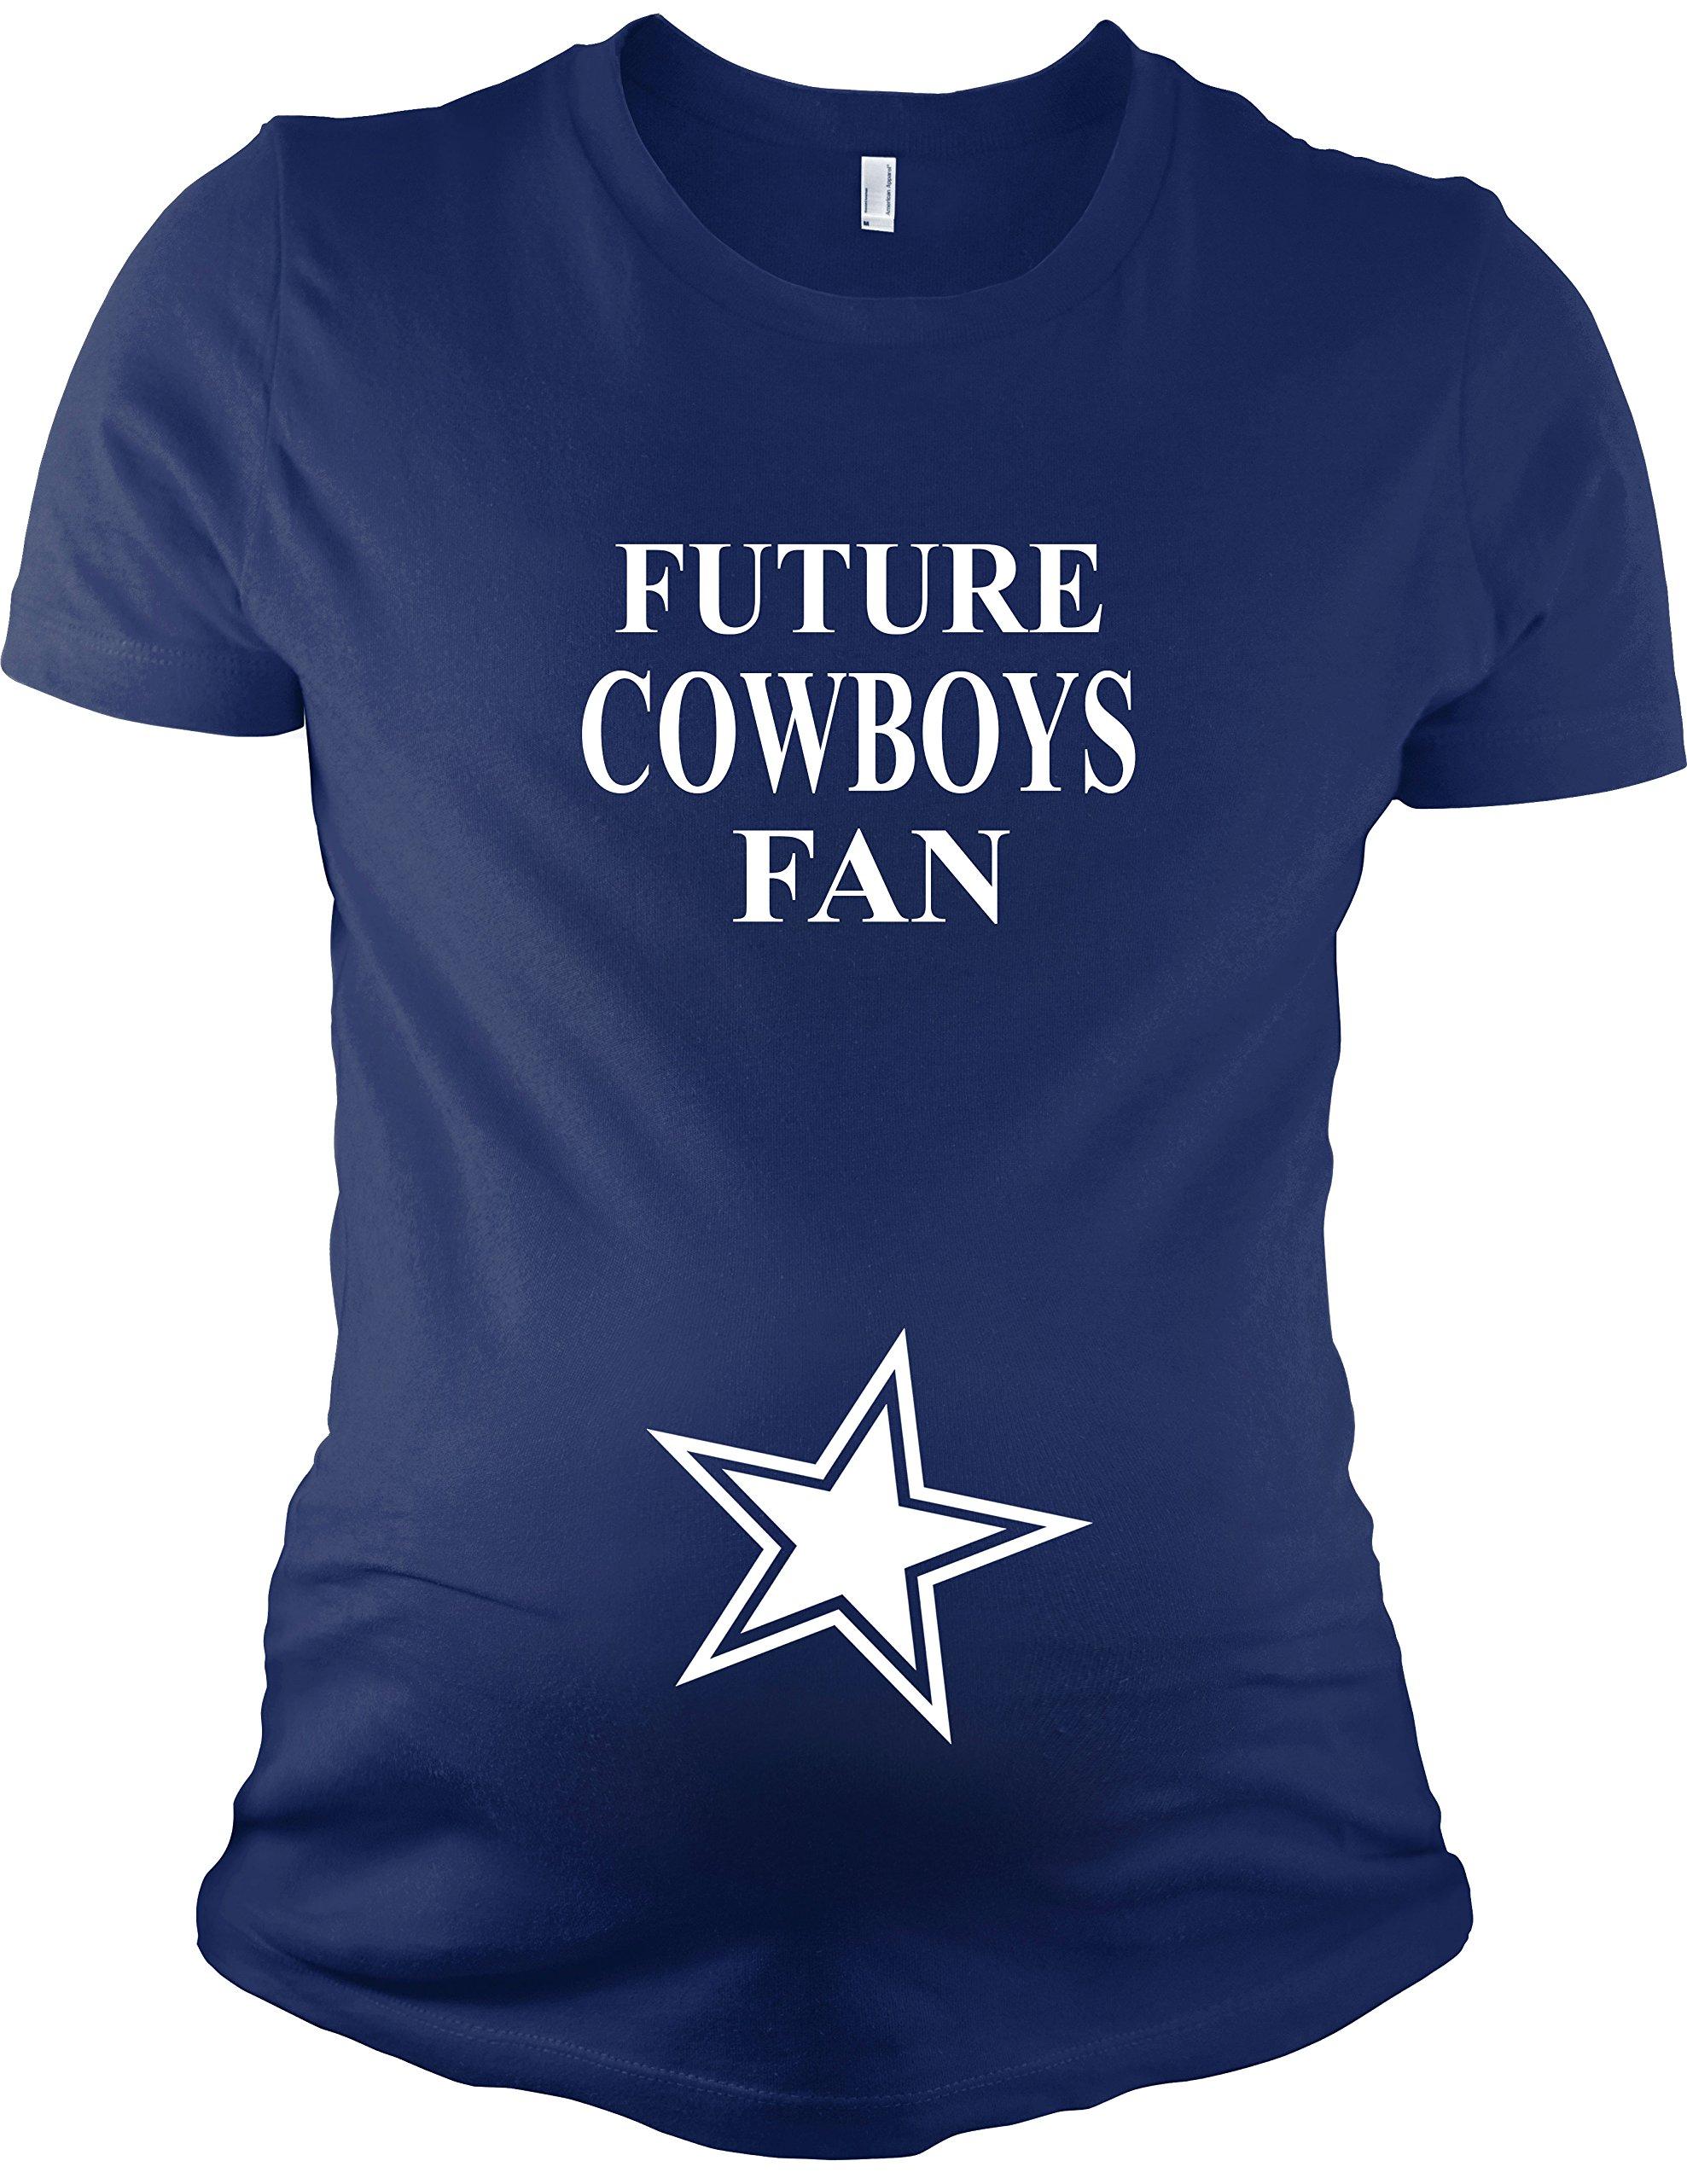 PandoraTees Maternity Short Sleeve T-Shirt - Future Cowboys Fan, Navy, L